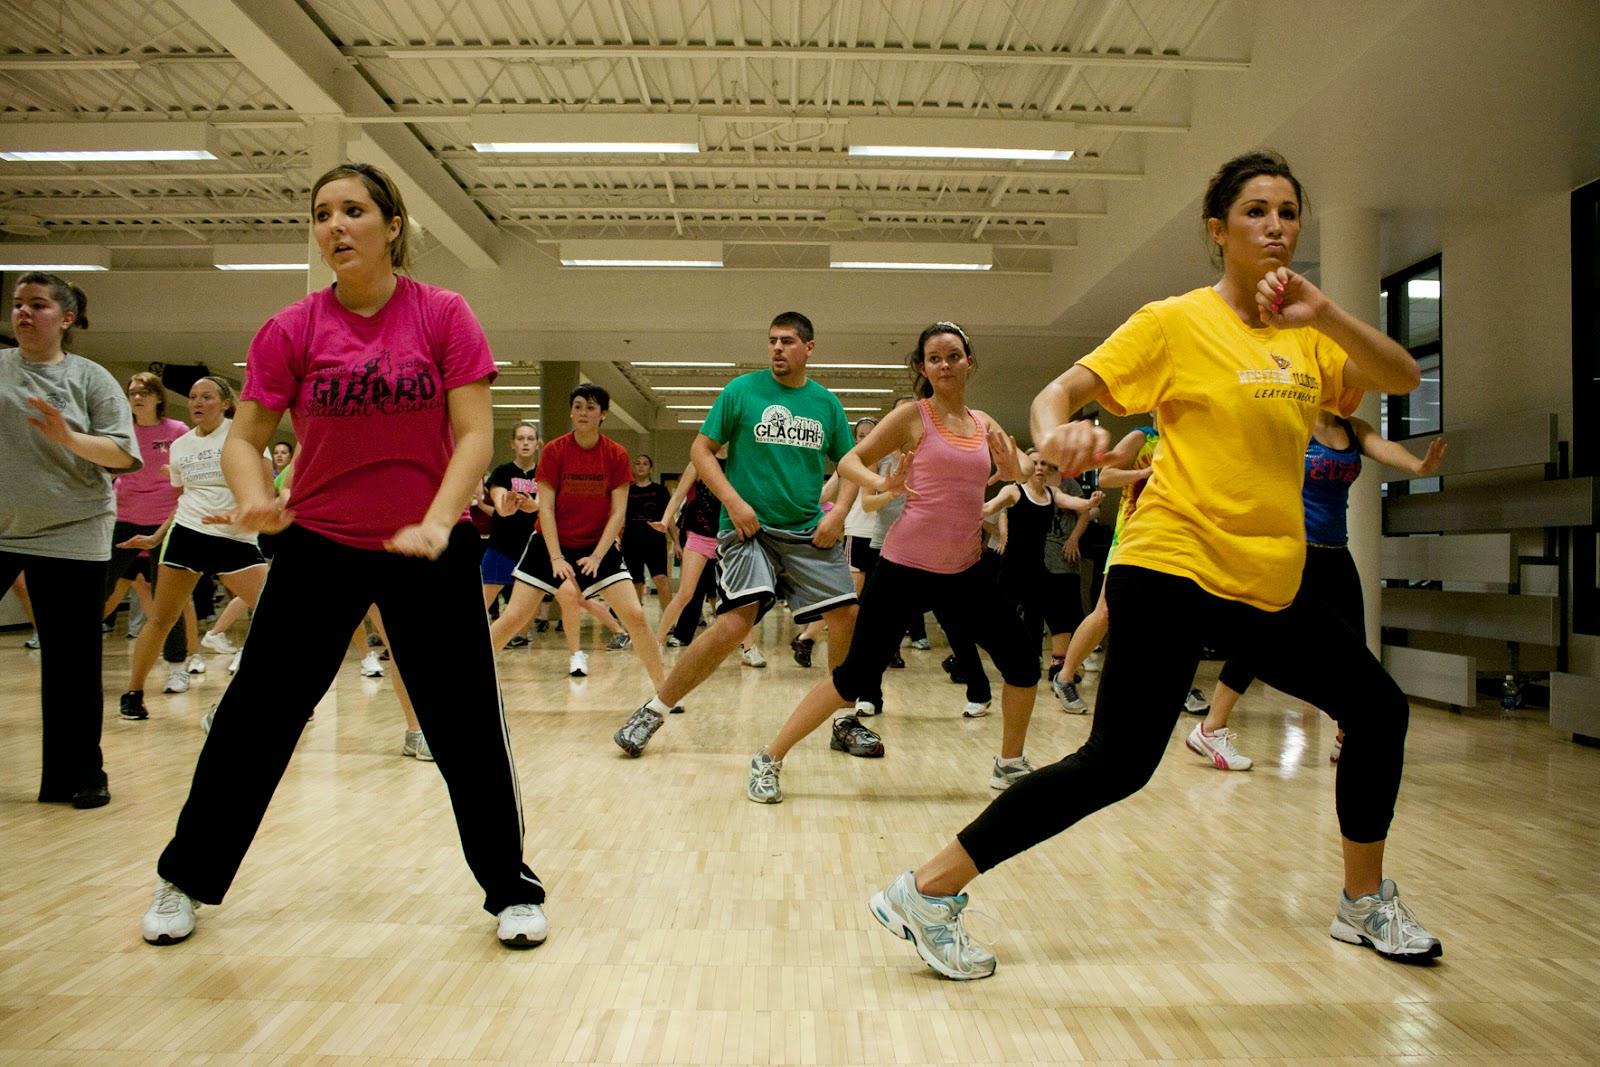 9 Jenis Olahraga Penambah Berat Badan yang Aman dan Mudah Dipraktekkan